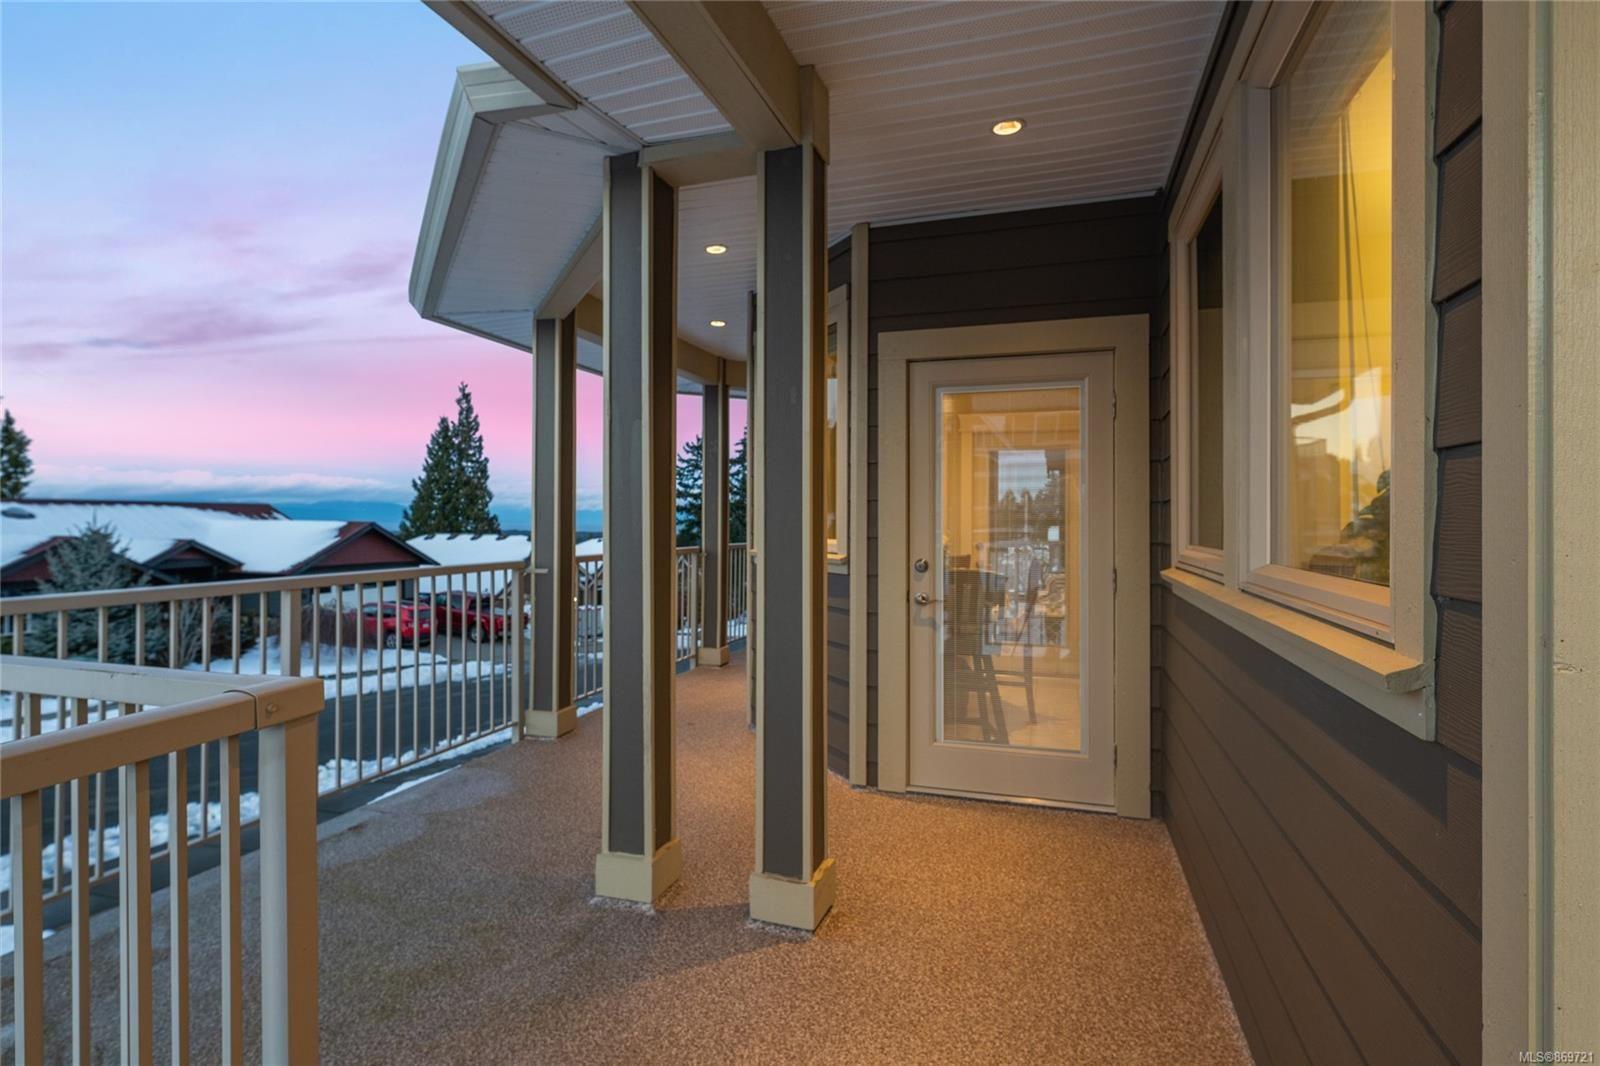 Photo 41: Photos: 2259 Leighton Rd in : Na South Jingle Pot House for sale (Nanaimo)  : MLS®# 869721